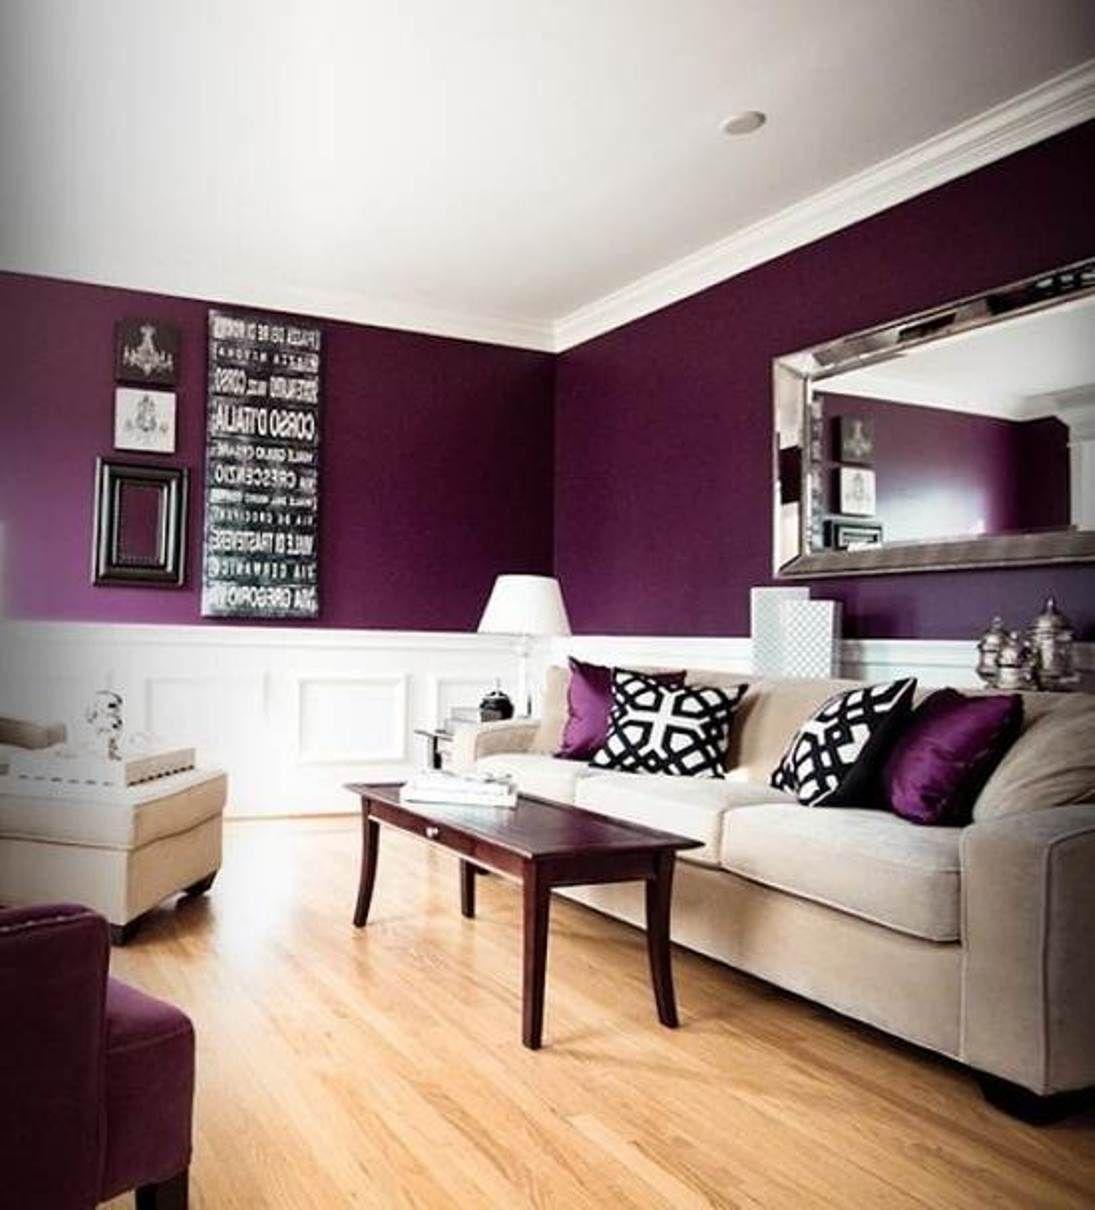 Living Room Color Palette: Purple Color Palettes For Living Rooms : Good Ideas Of